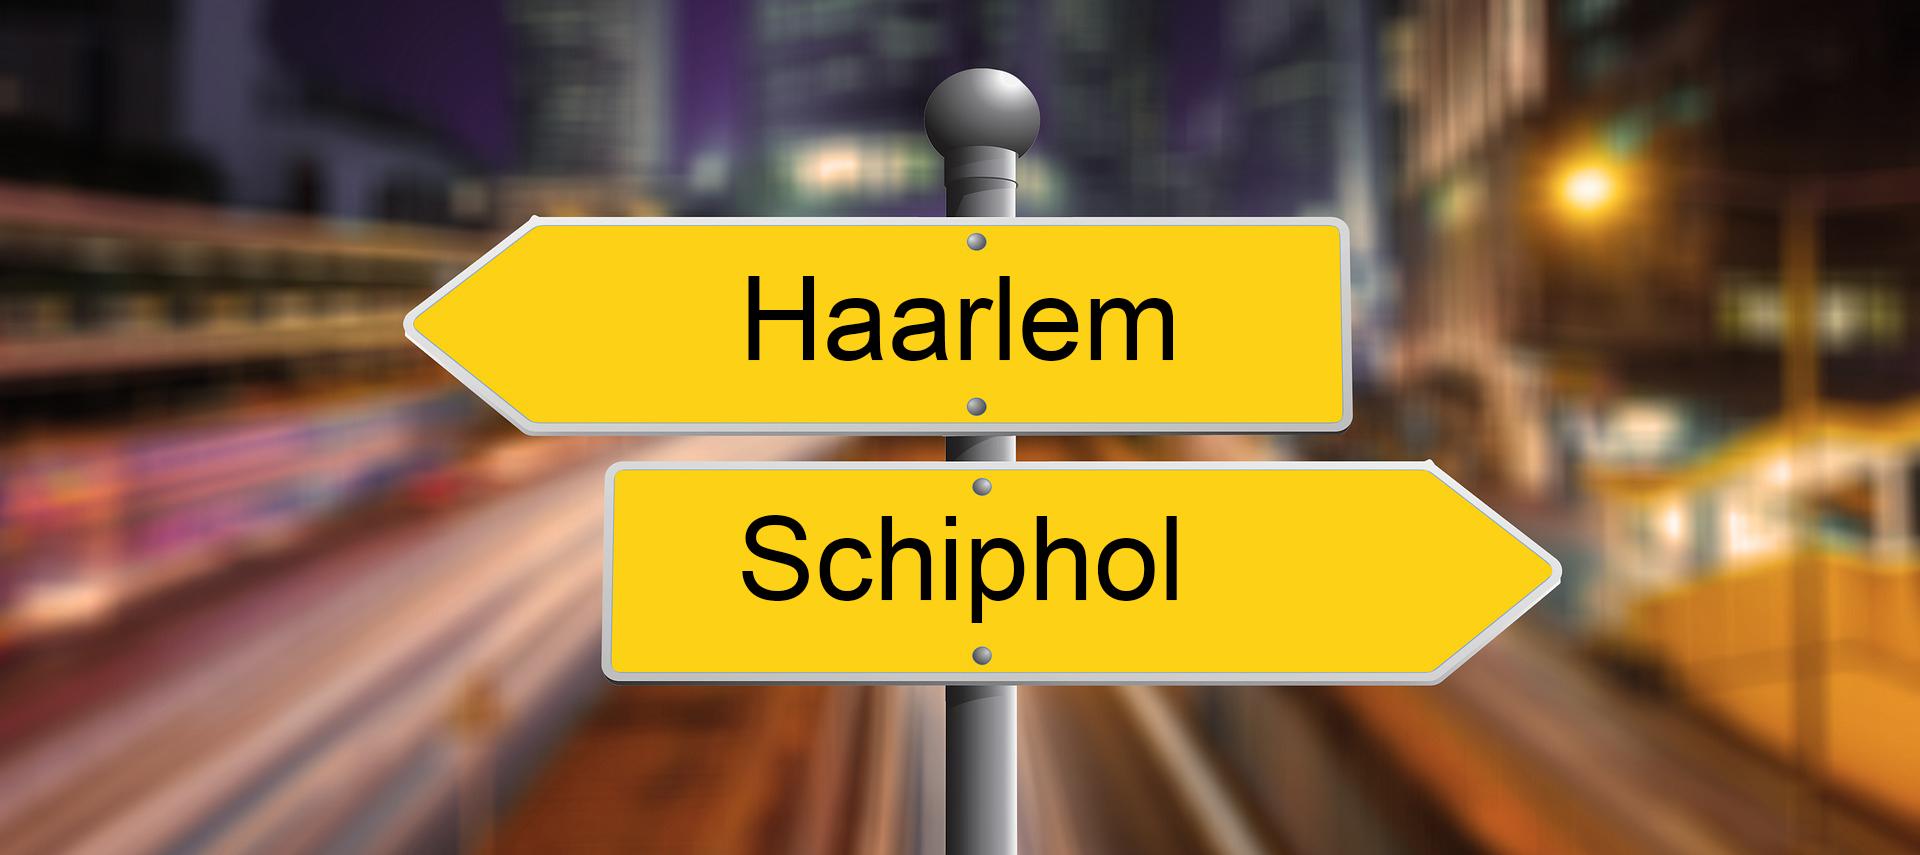 Schiphol Haarlem taxi